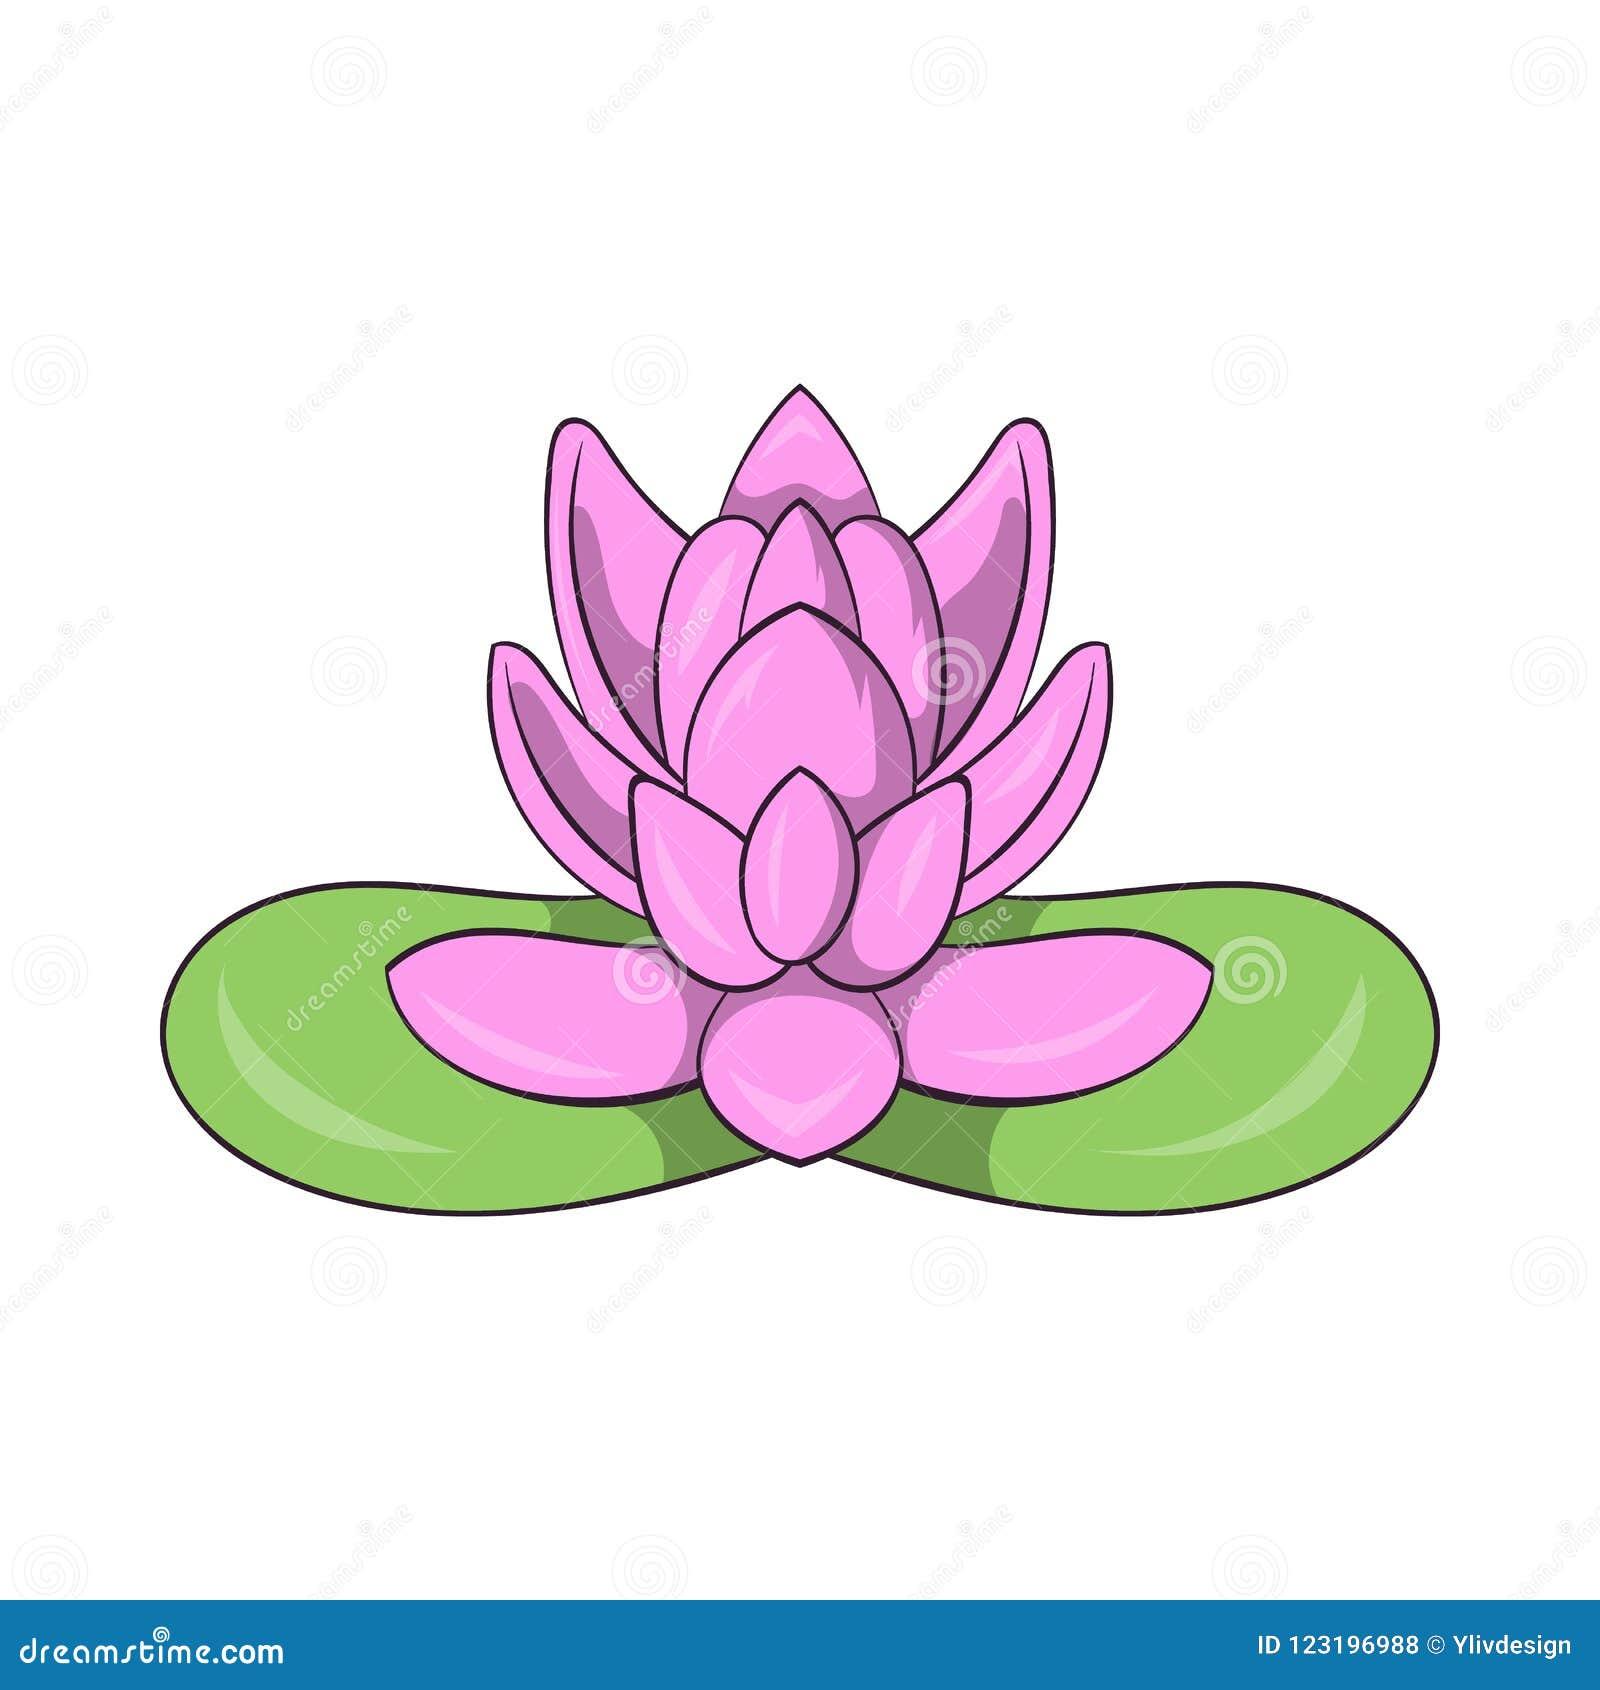 Pink lotus flower icon cartoon style stock illustration download pink lotus flower icon cartoon style stock illustration illustration of leaf icon mightylinksfo